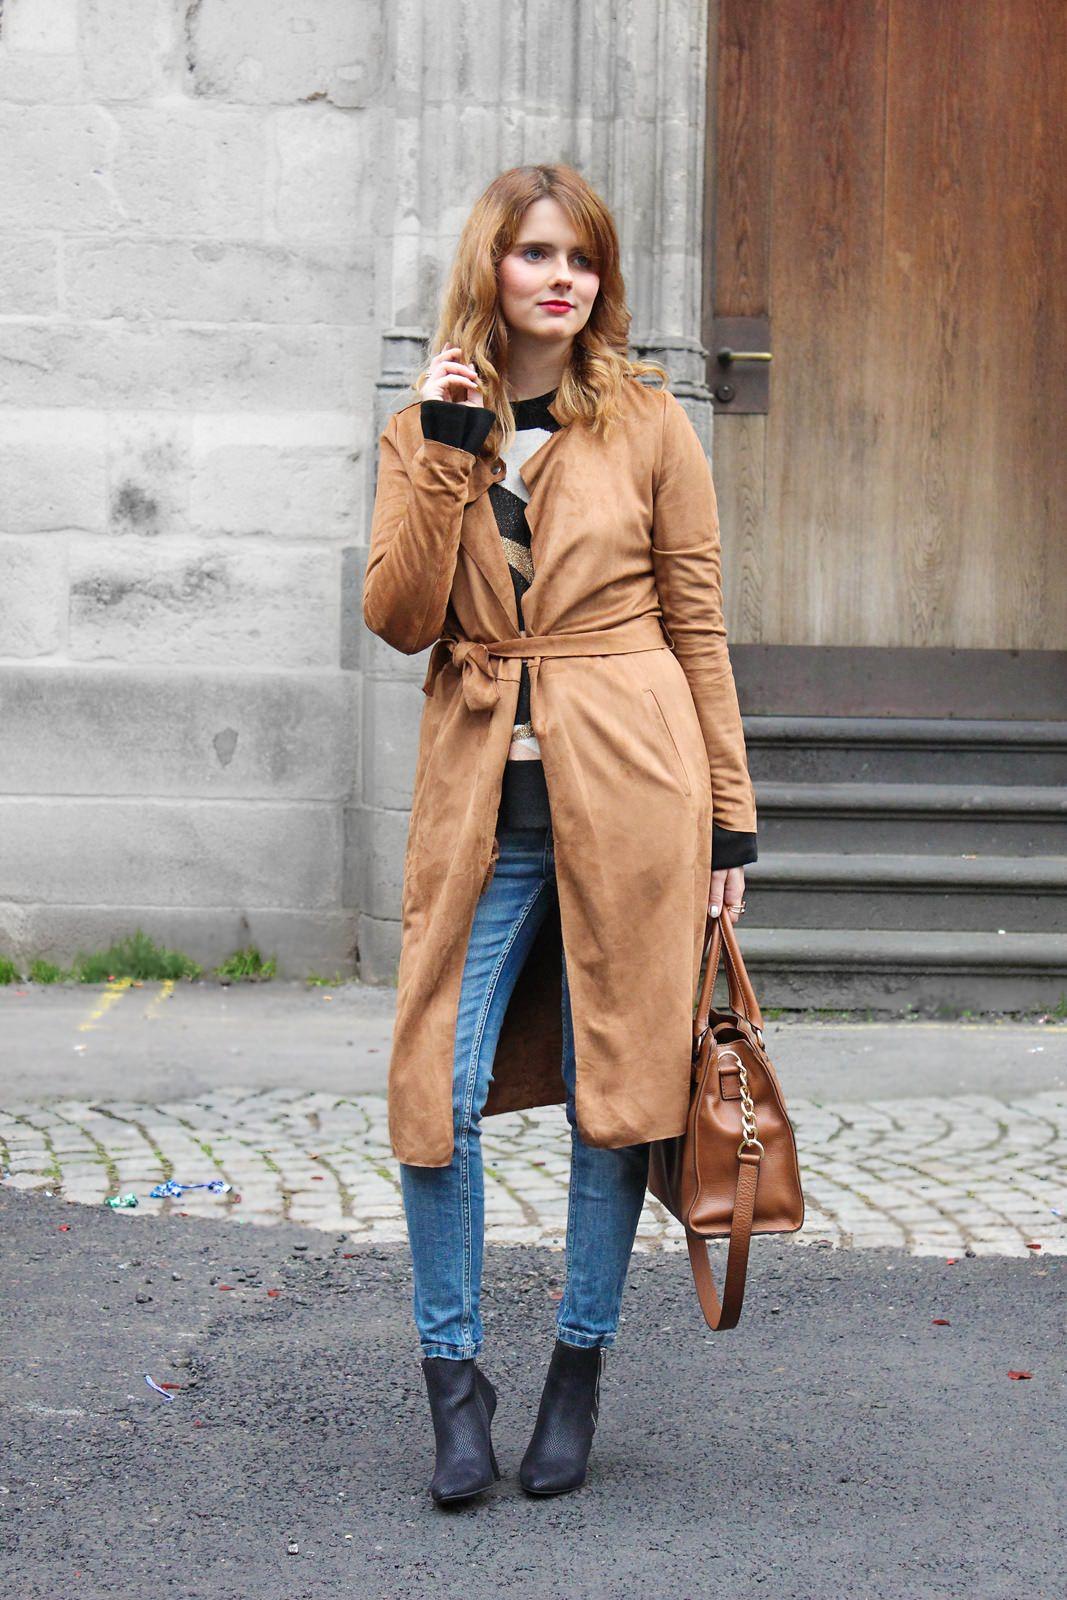 desbelleschoses-outfit-70er-jahre-trend-im-herbst-brauner-suede-trenchcoat 9